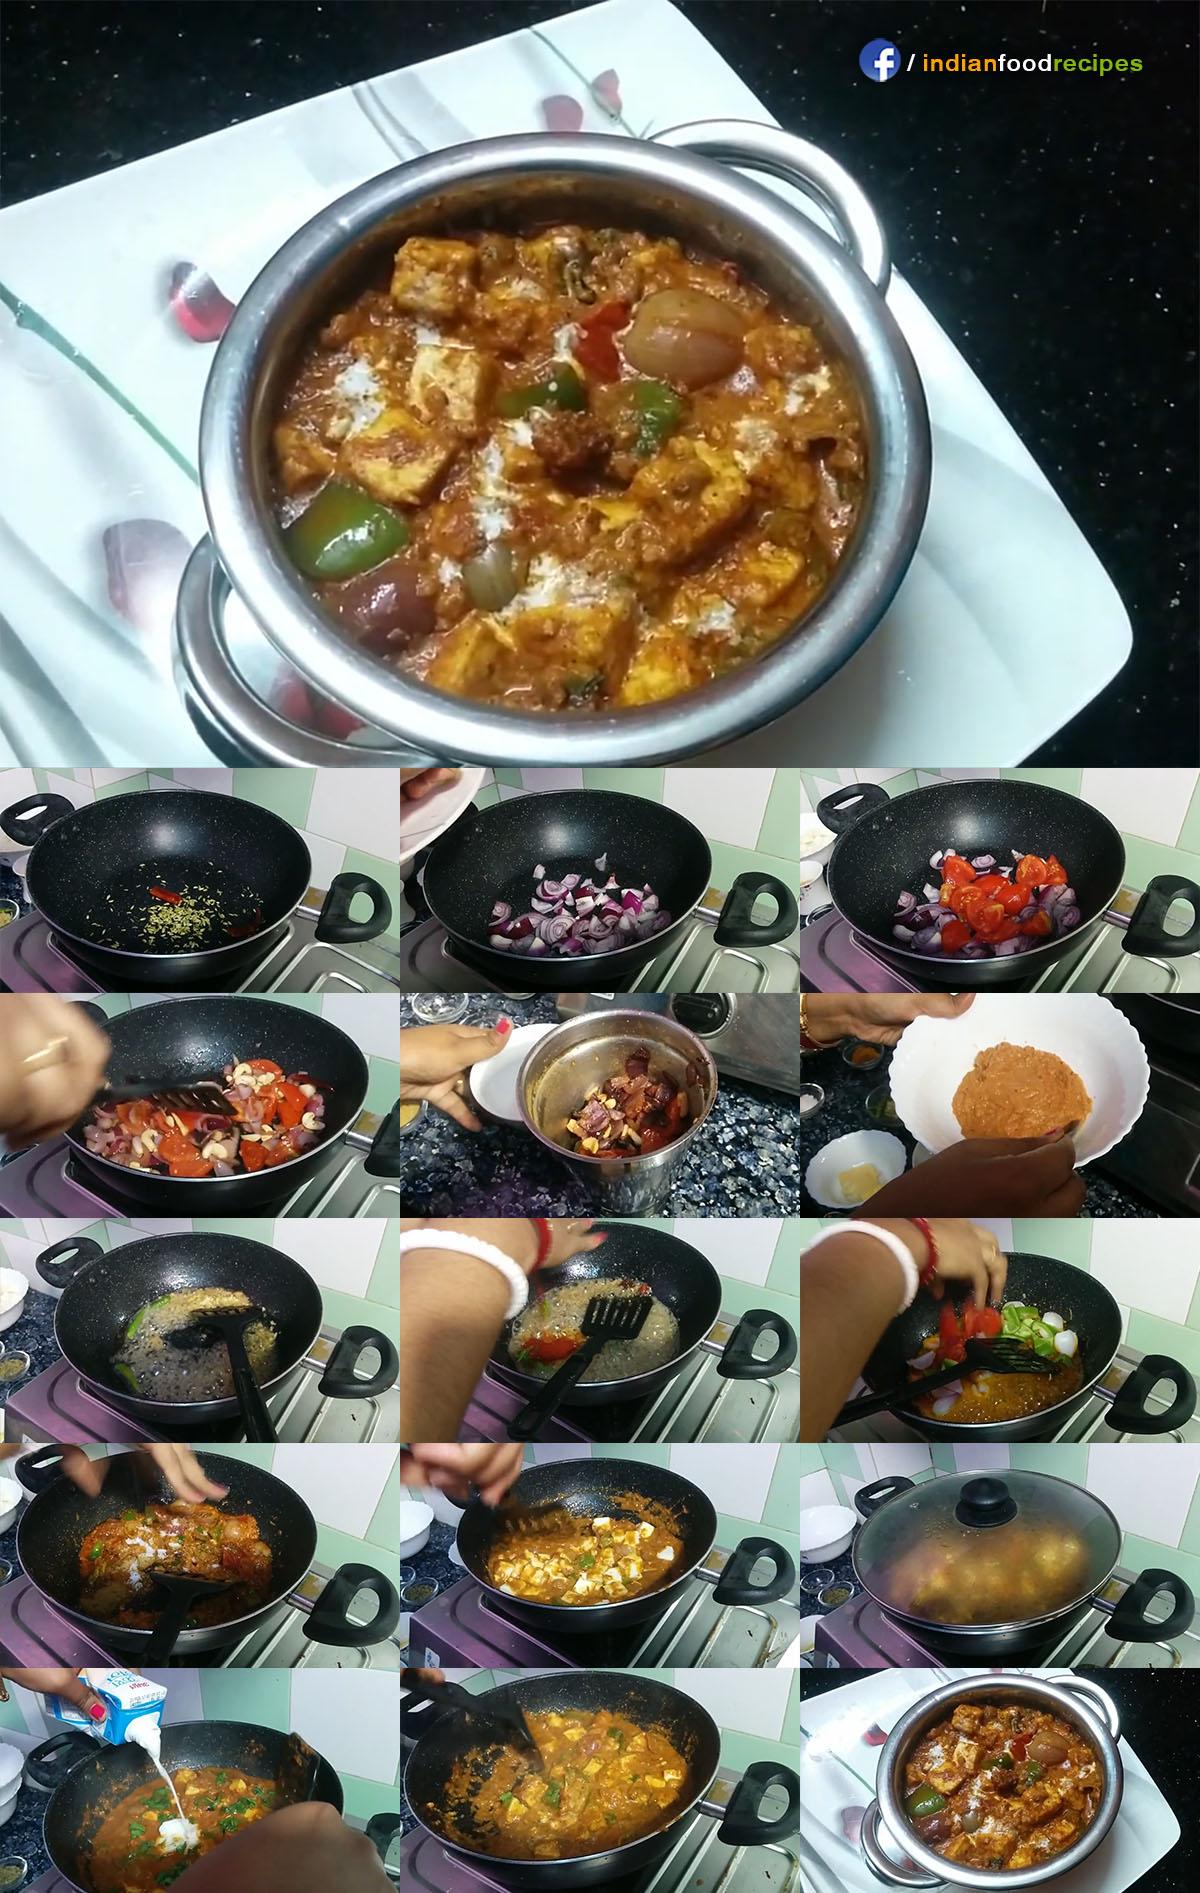 Kadai Paneer In Authentic Punjabi Dhaba Style recipe step by step